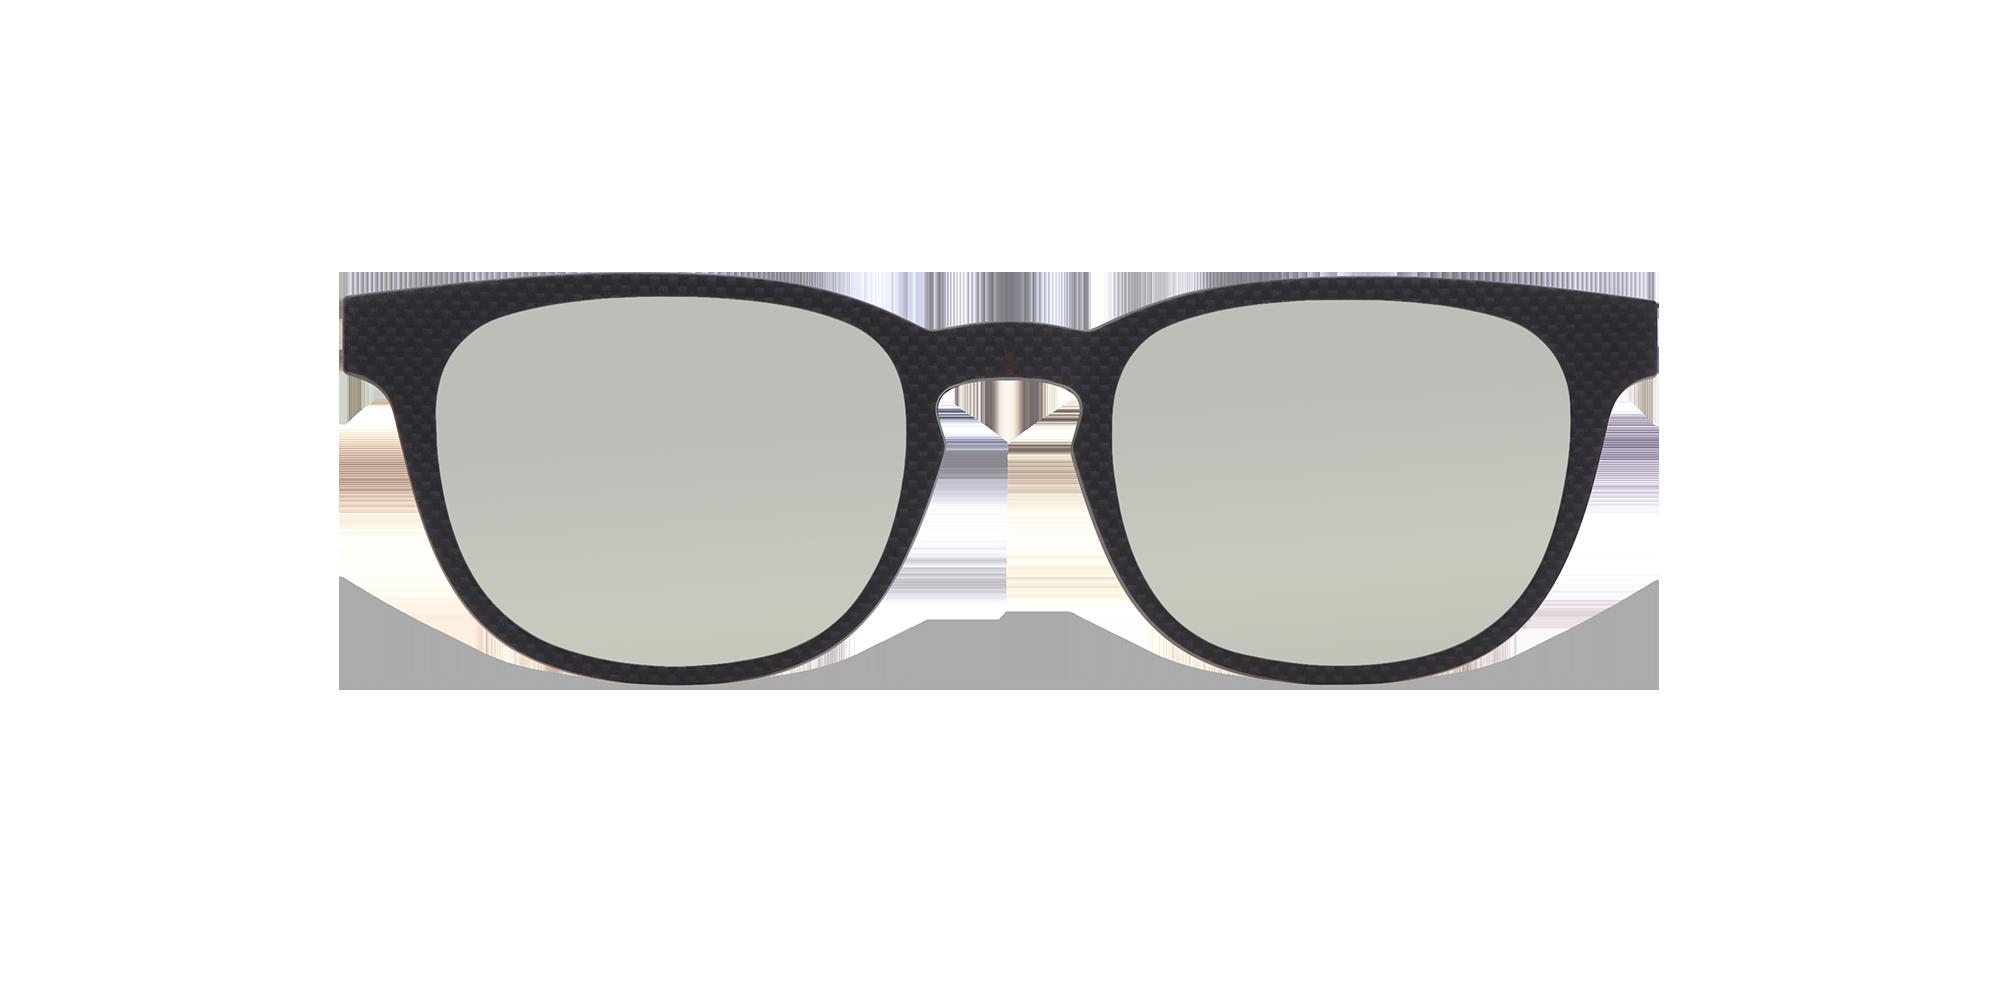 afflelou/france/products/smart_clip/clips_glasses/TMK33R3BK015120.png